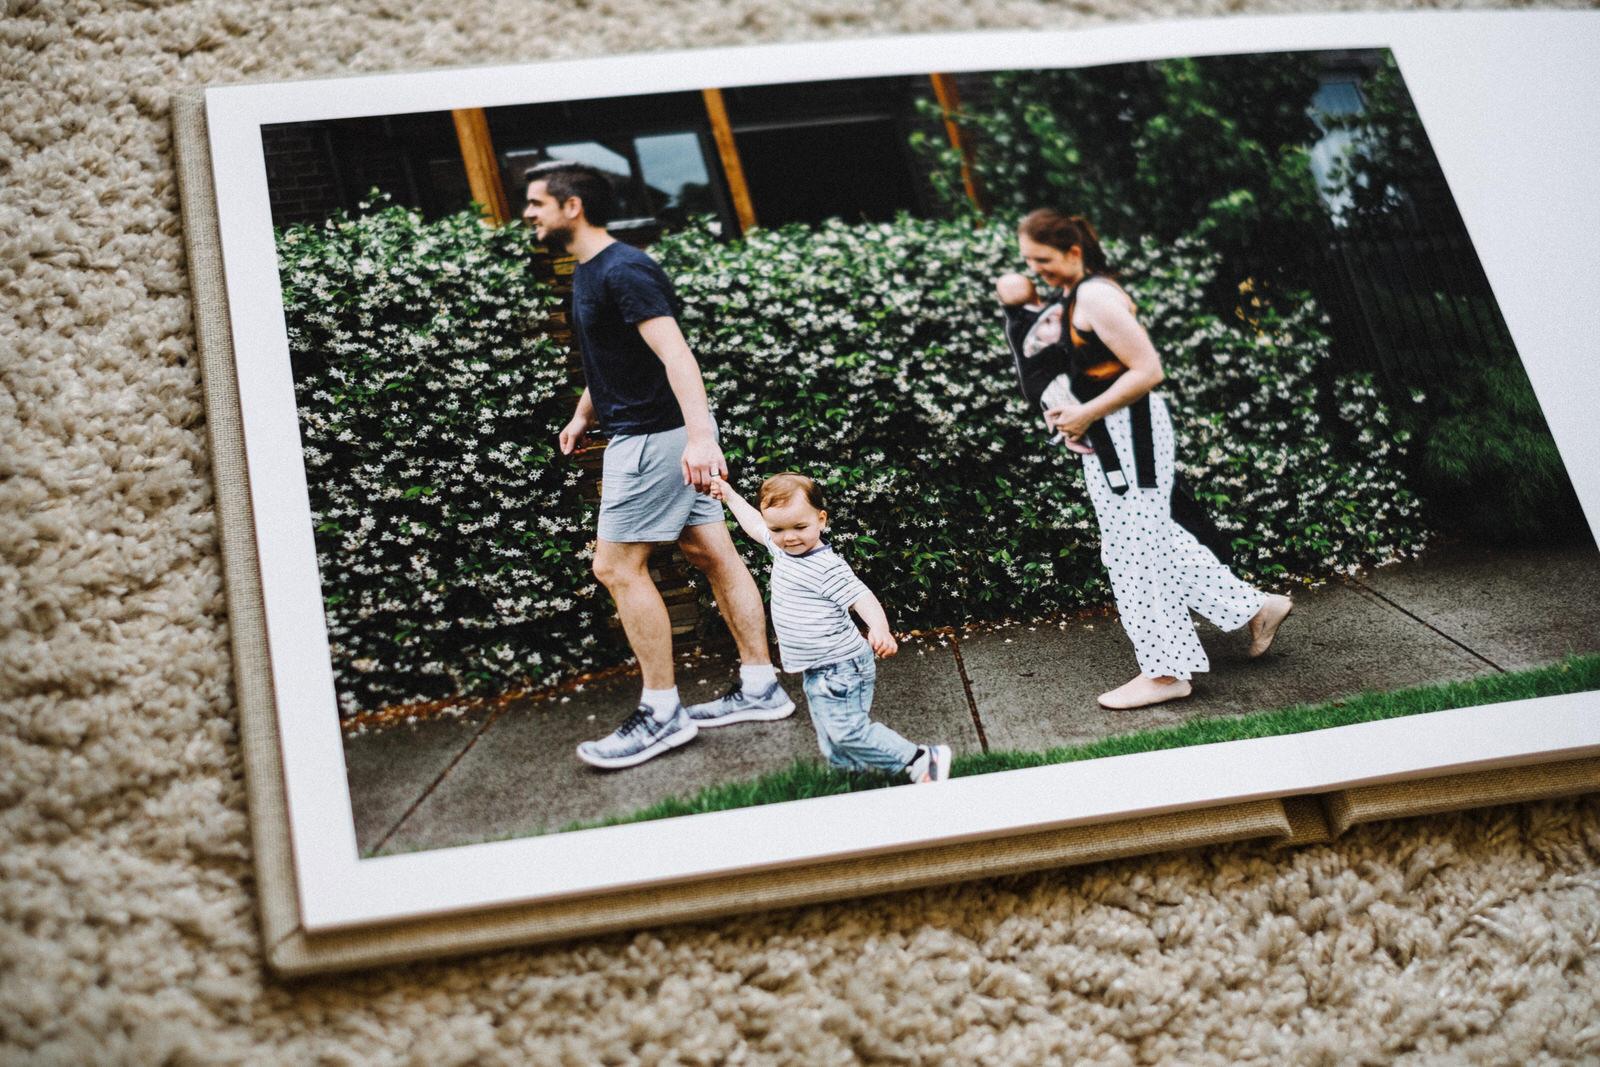 family-story-photos-photo-album-07.jpg